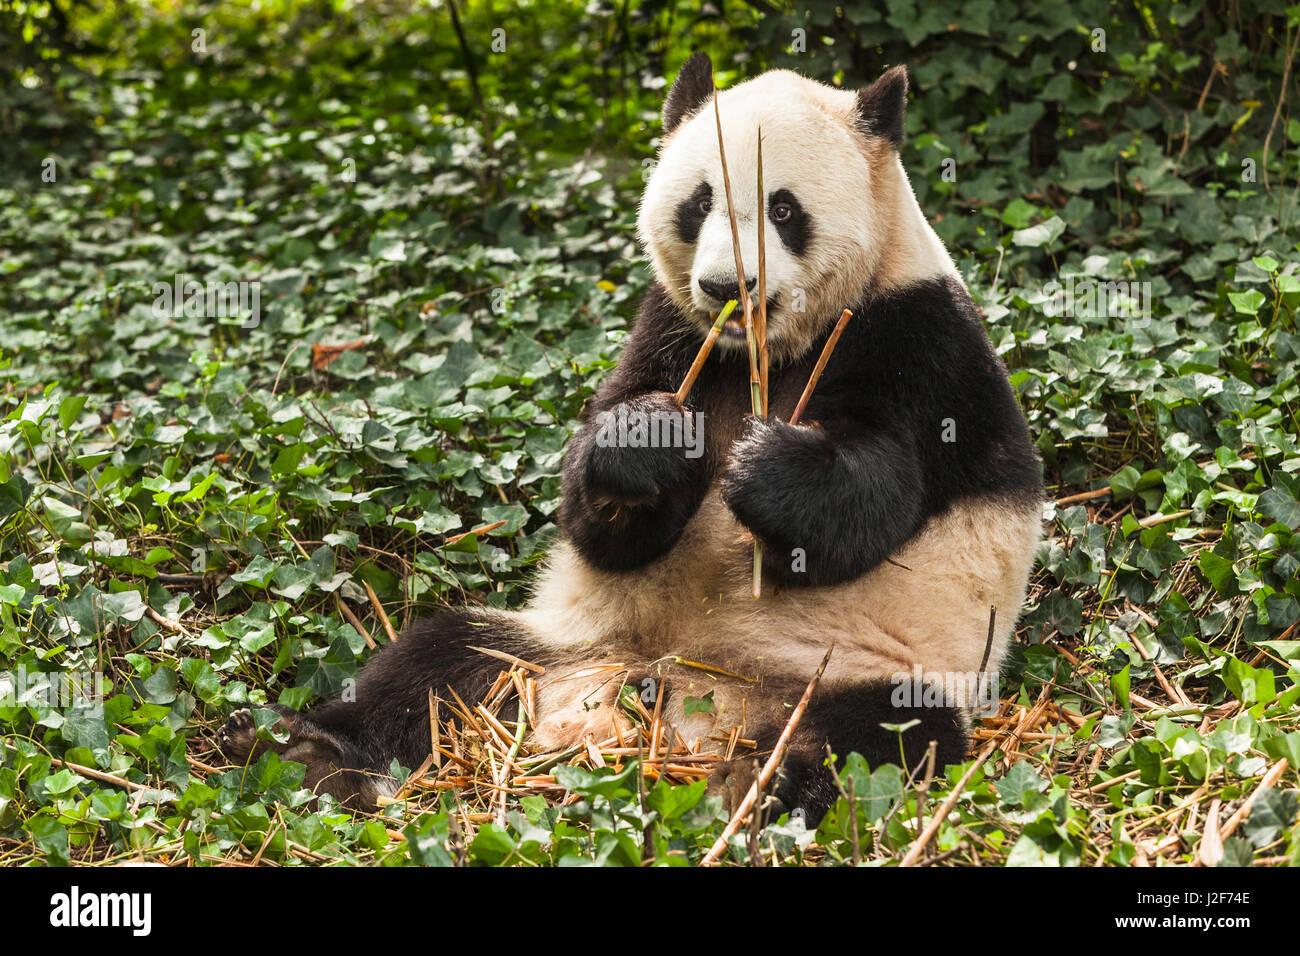 Giant Panda Bambus Essen Stockfoto Bild 139247150 Alamy